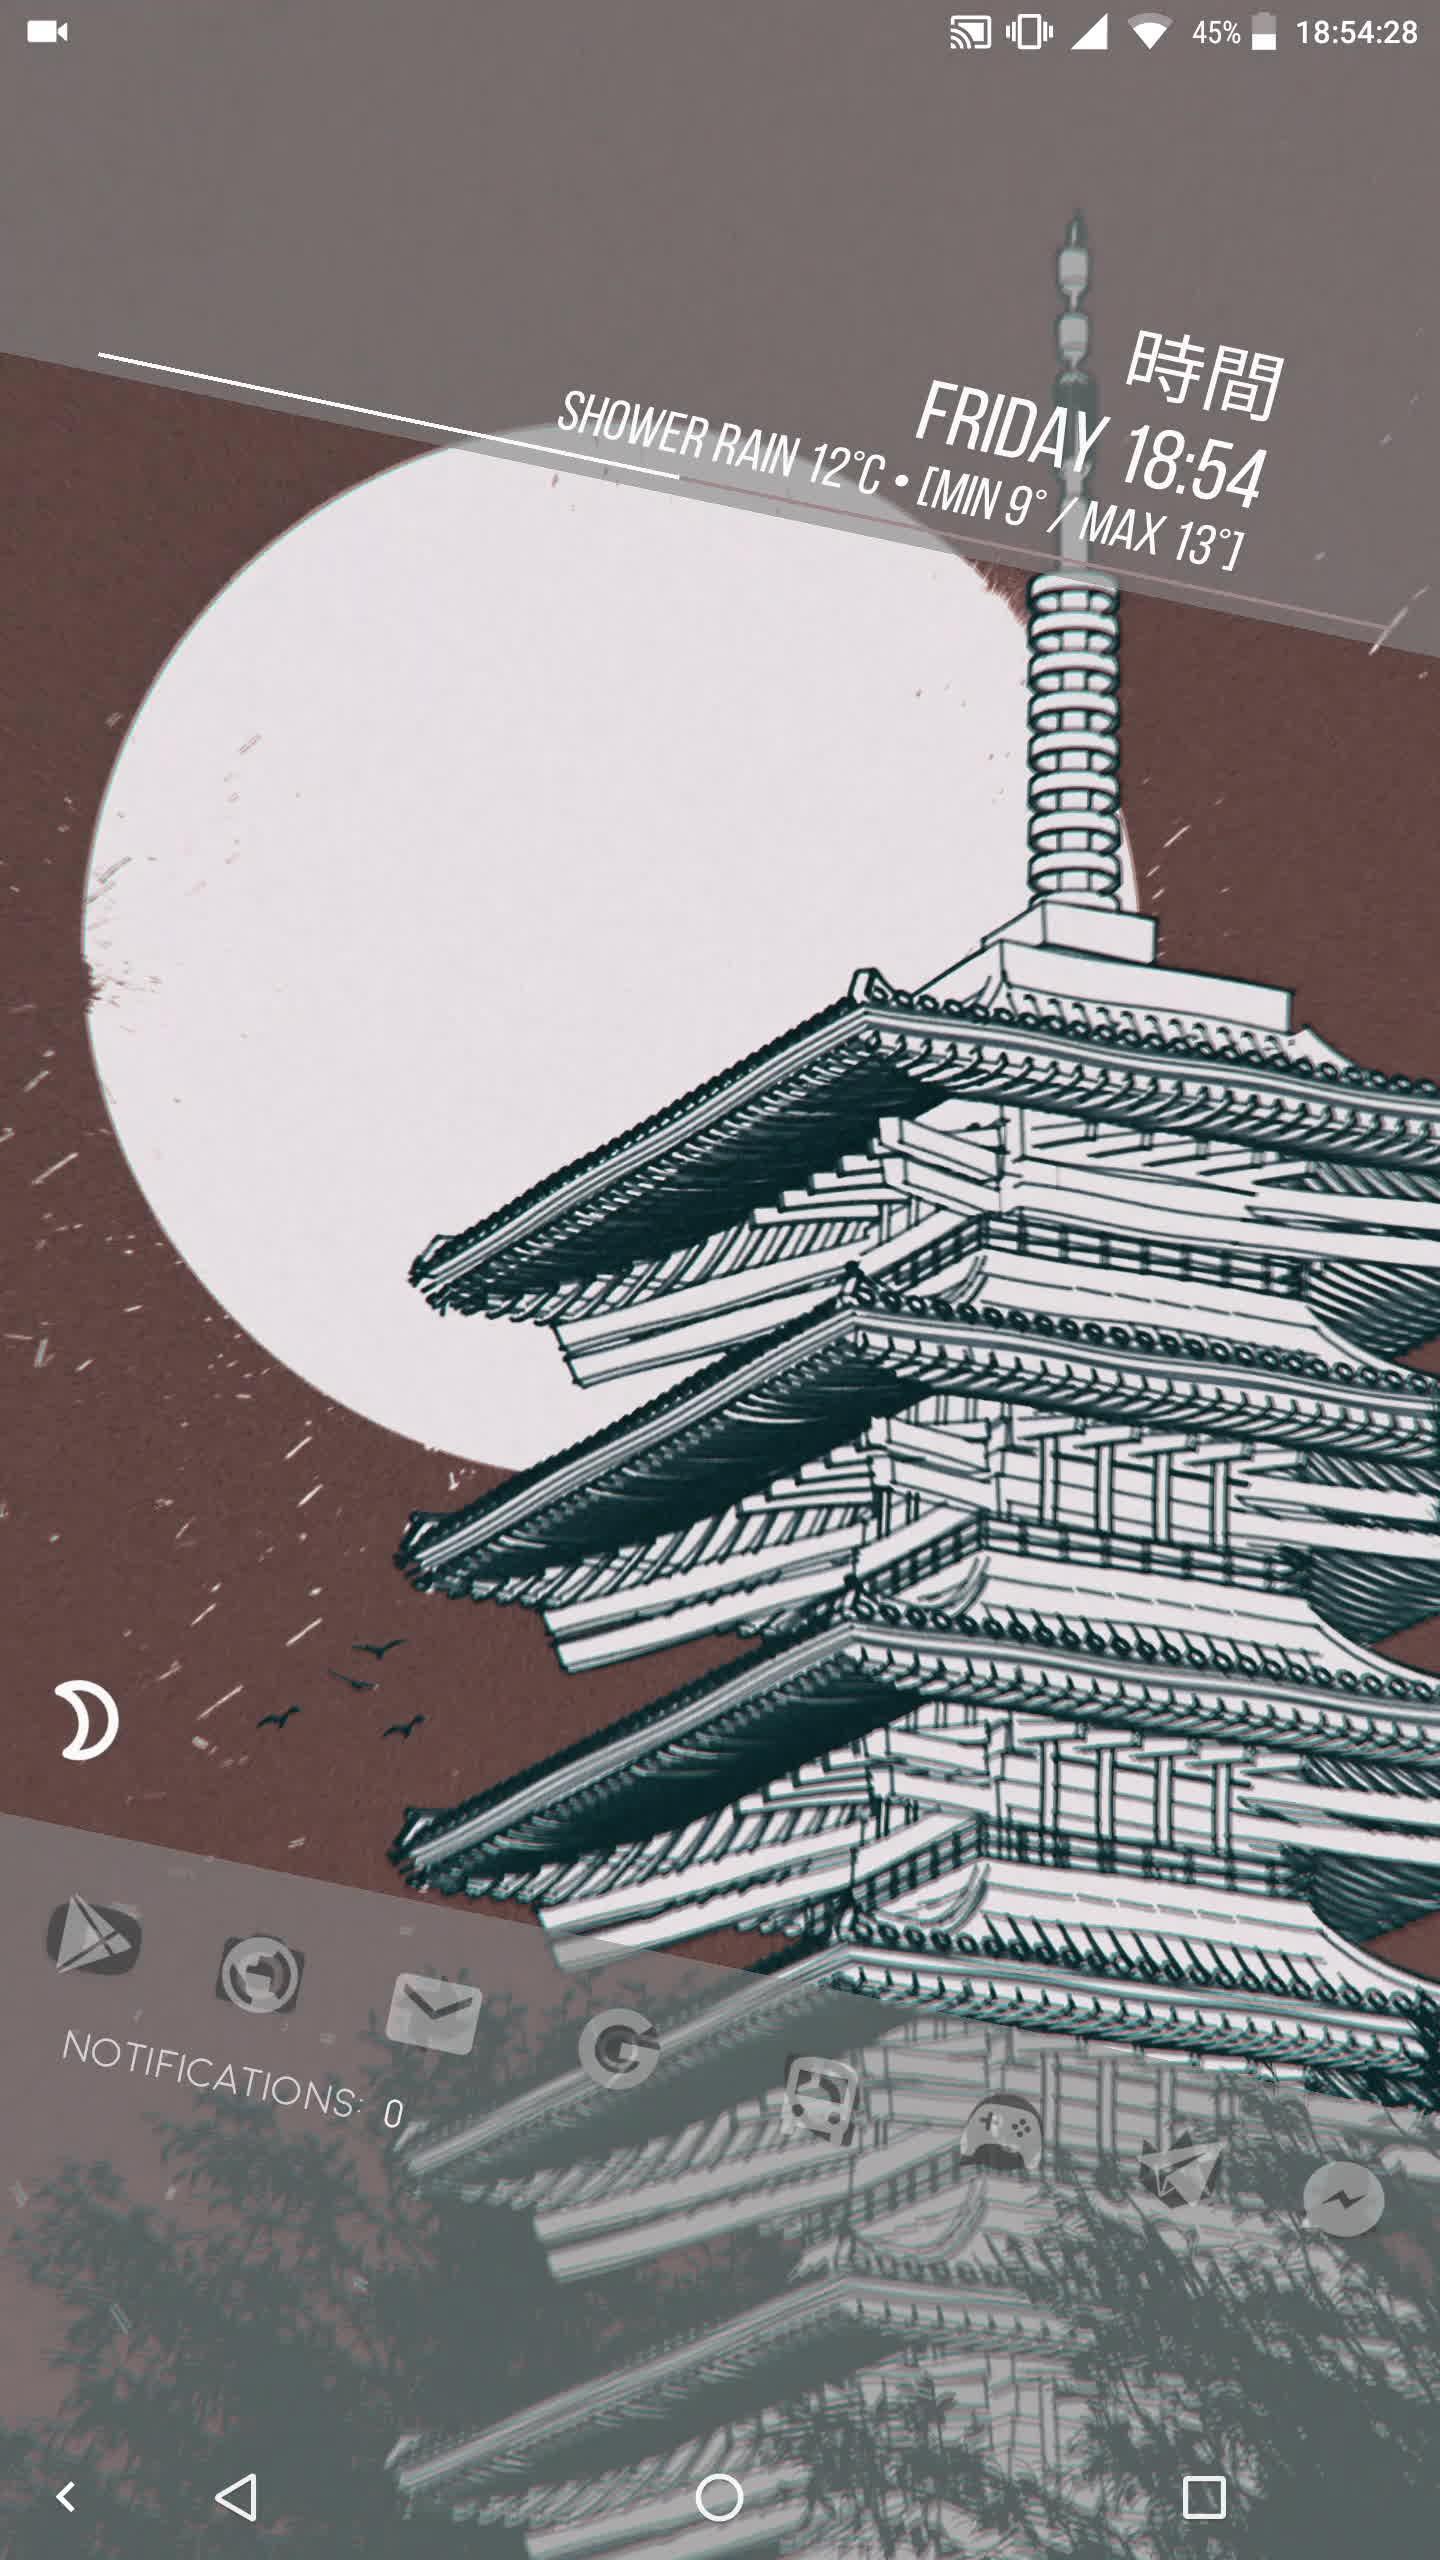 androidthemes, Kyoto GIFs